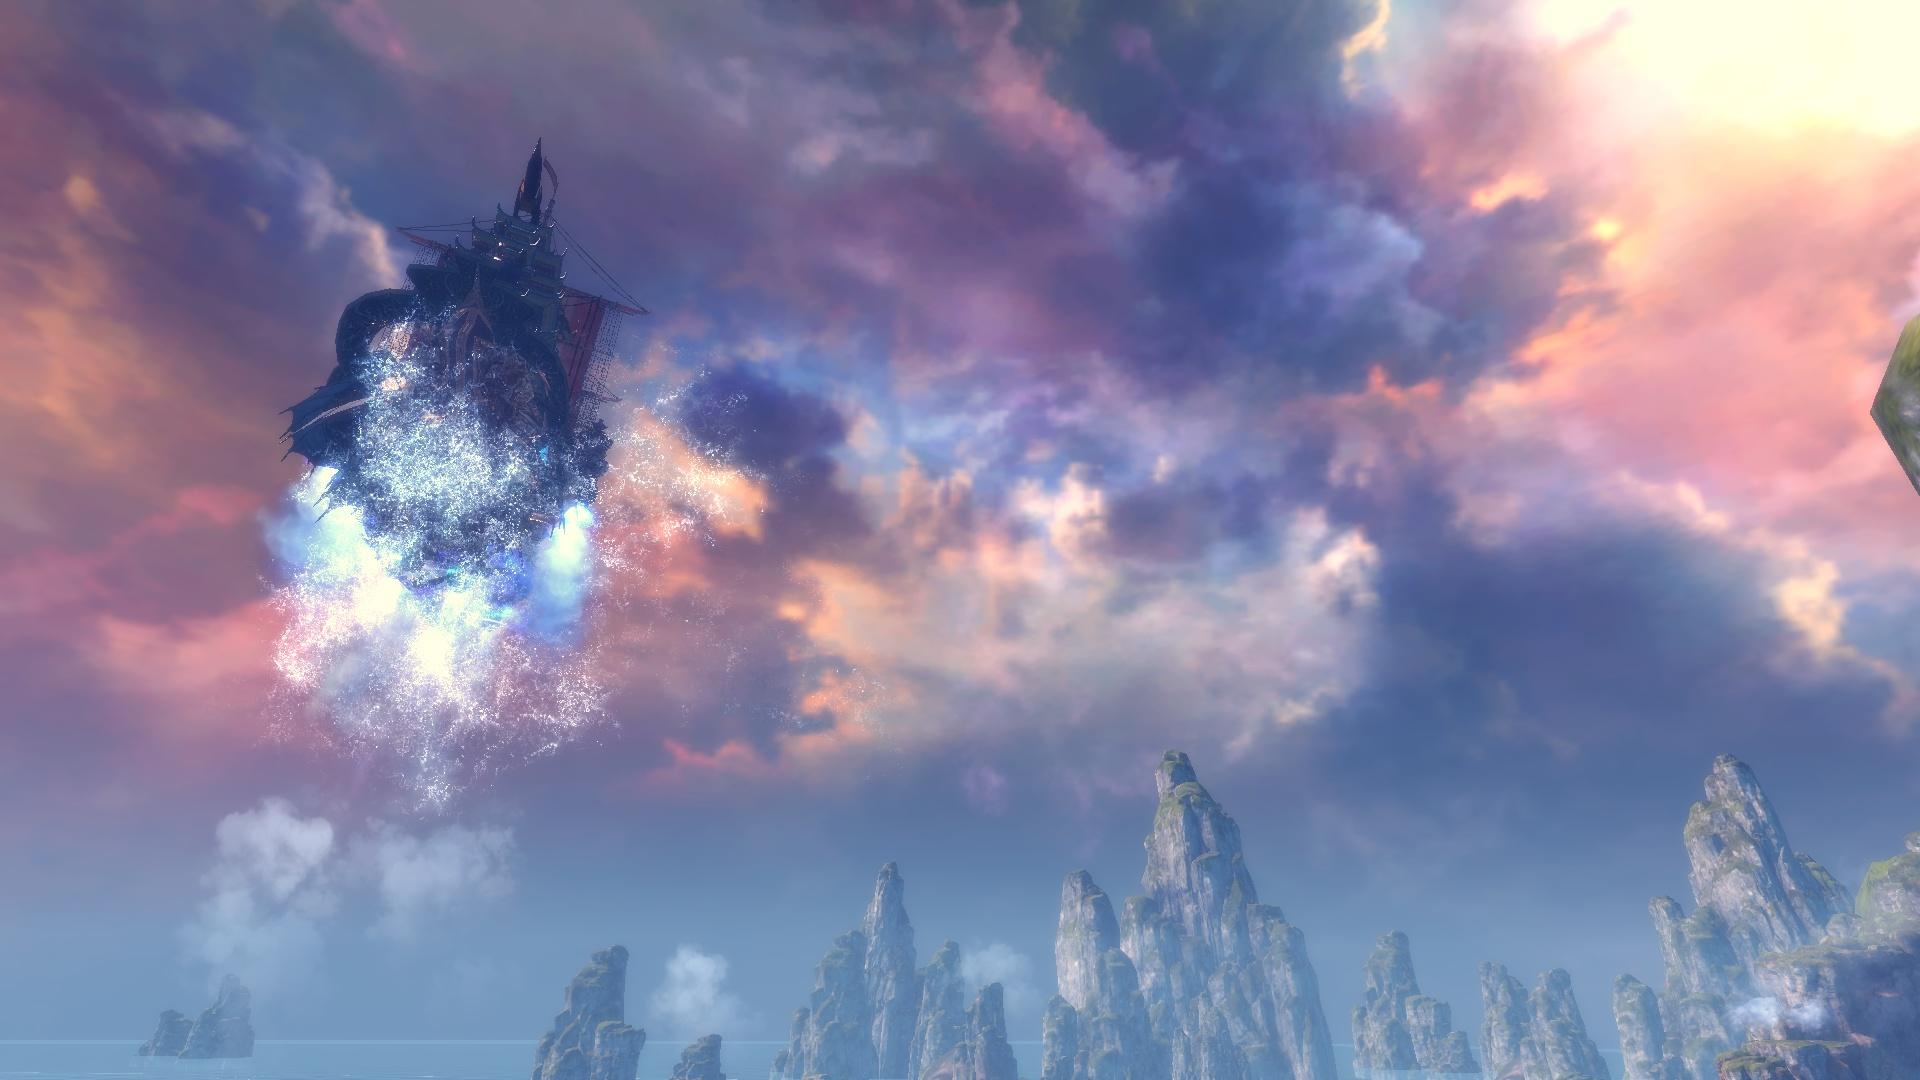 3rd-strike com   Blade & Soul: Warden's Fury – Review